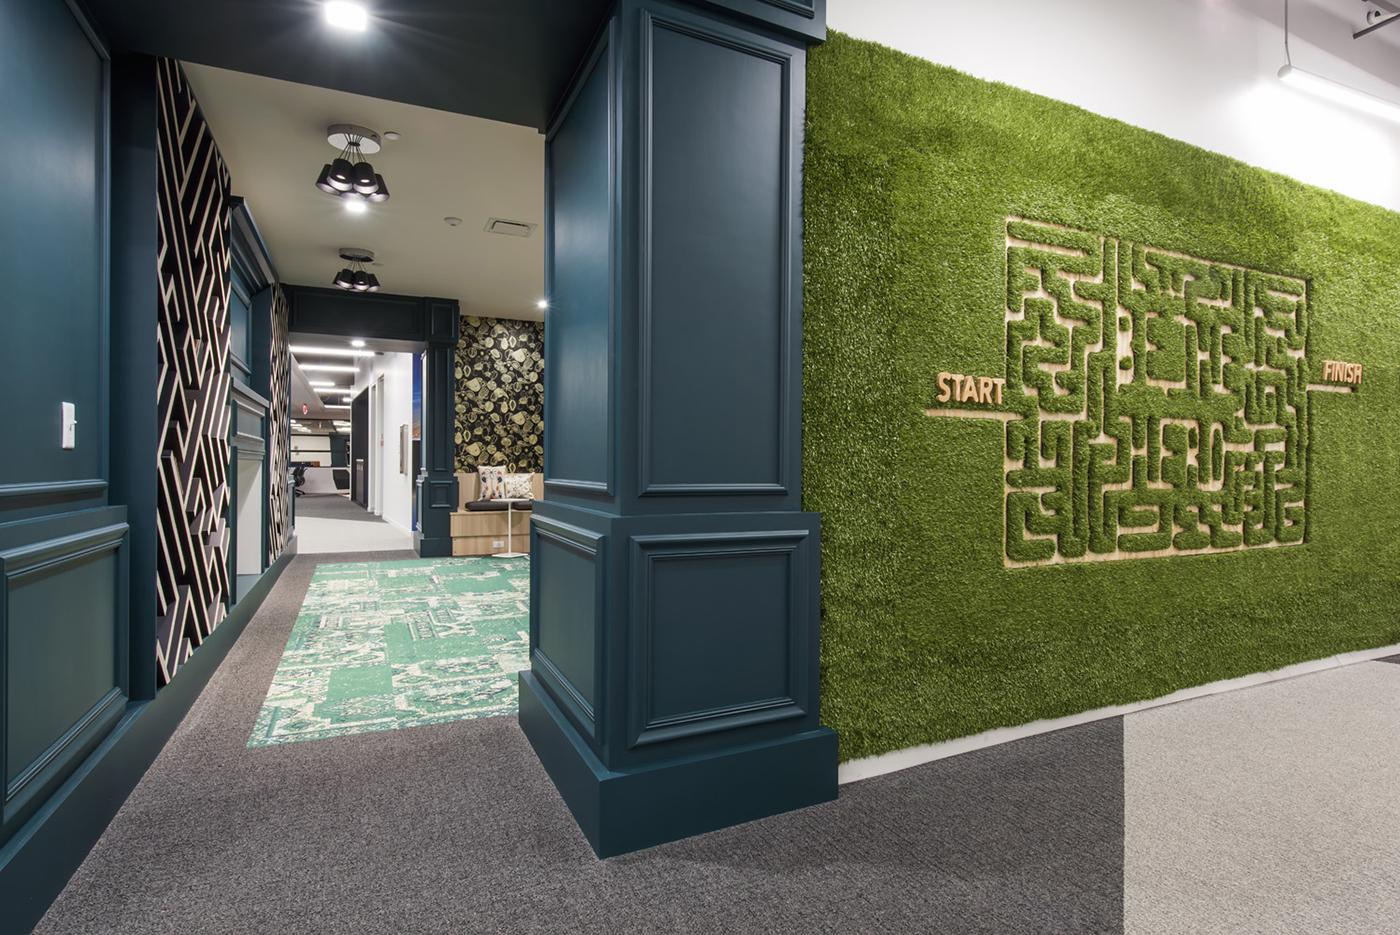 linkedin-omaha-office-3